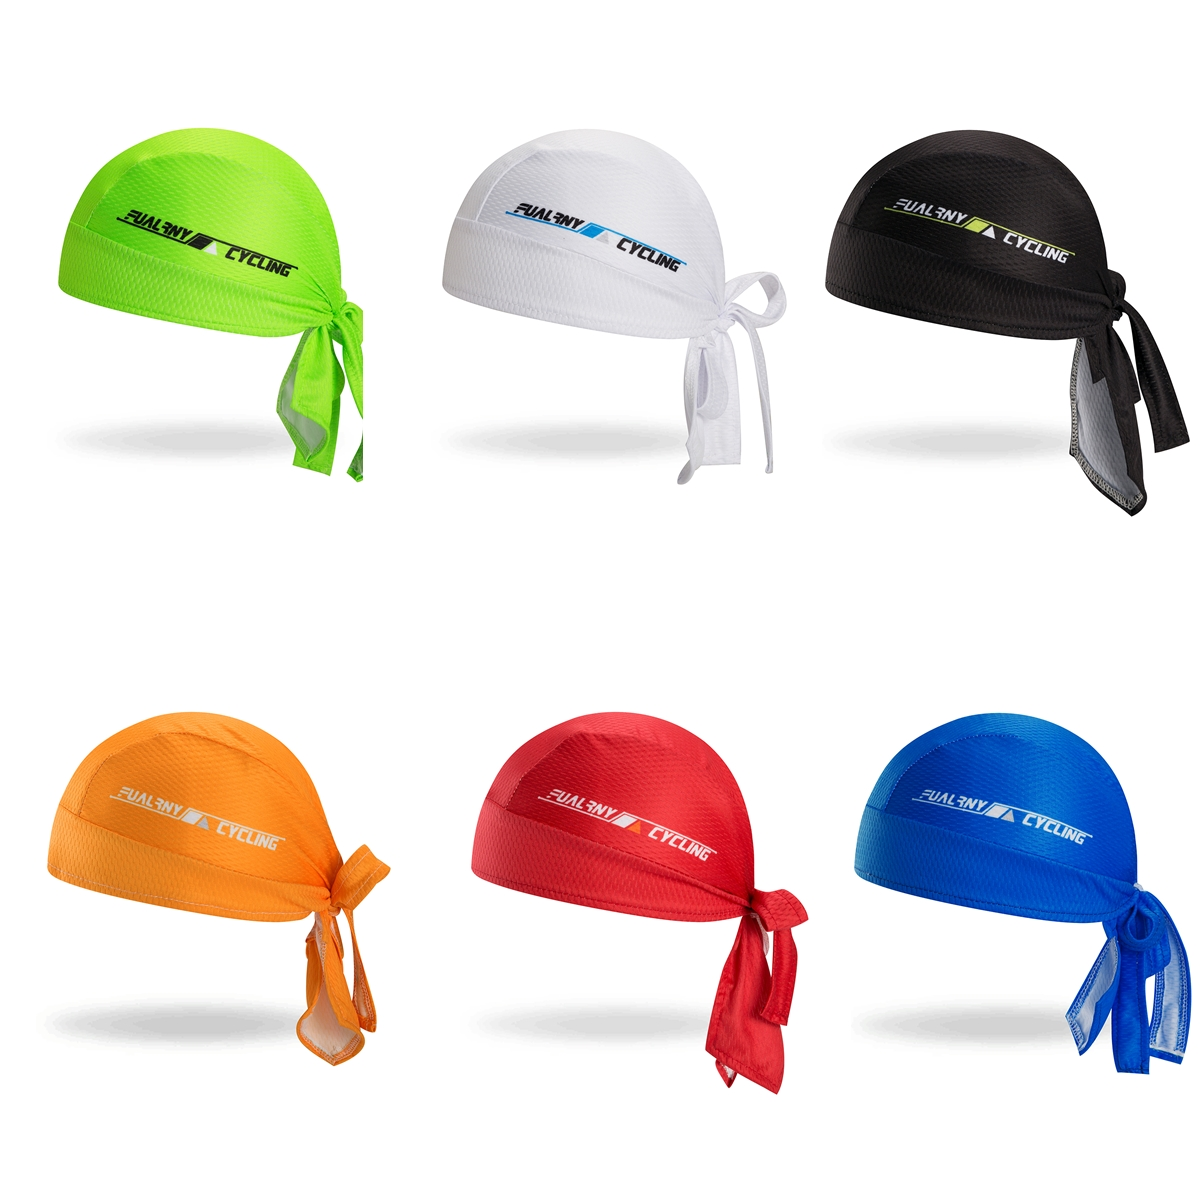 Fualrny 100% полиэстер modesti Открытый спорт MTB Велосипедный Спорт Бандана шляпа Велос ...